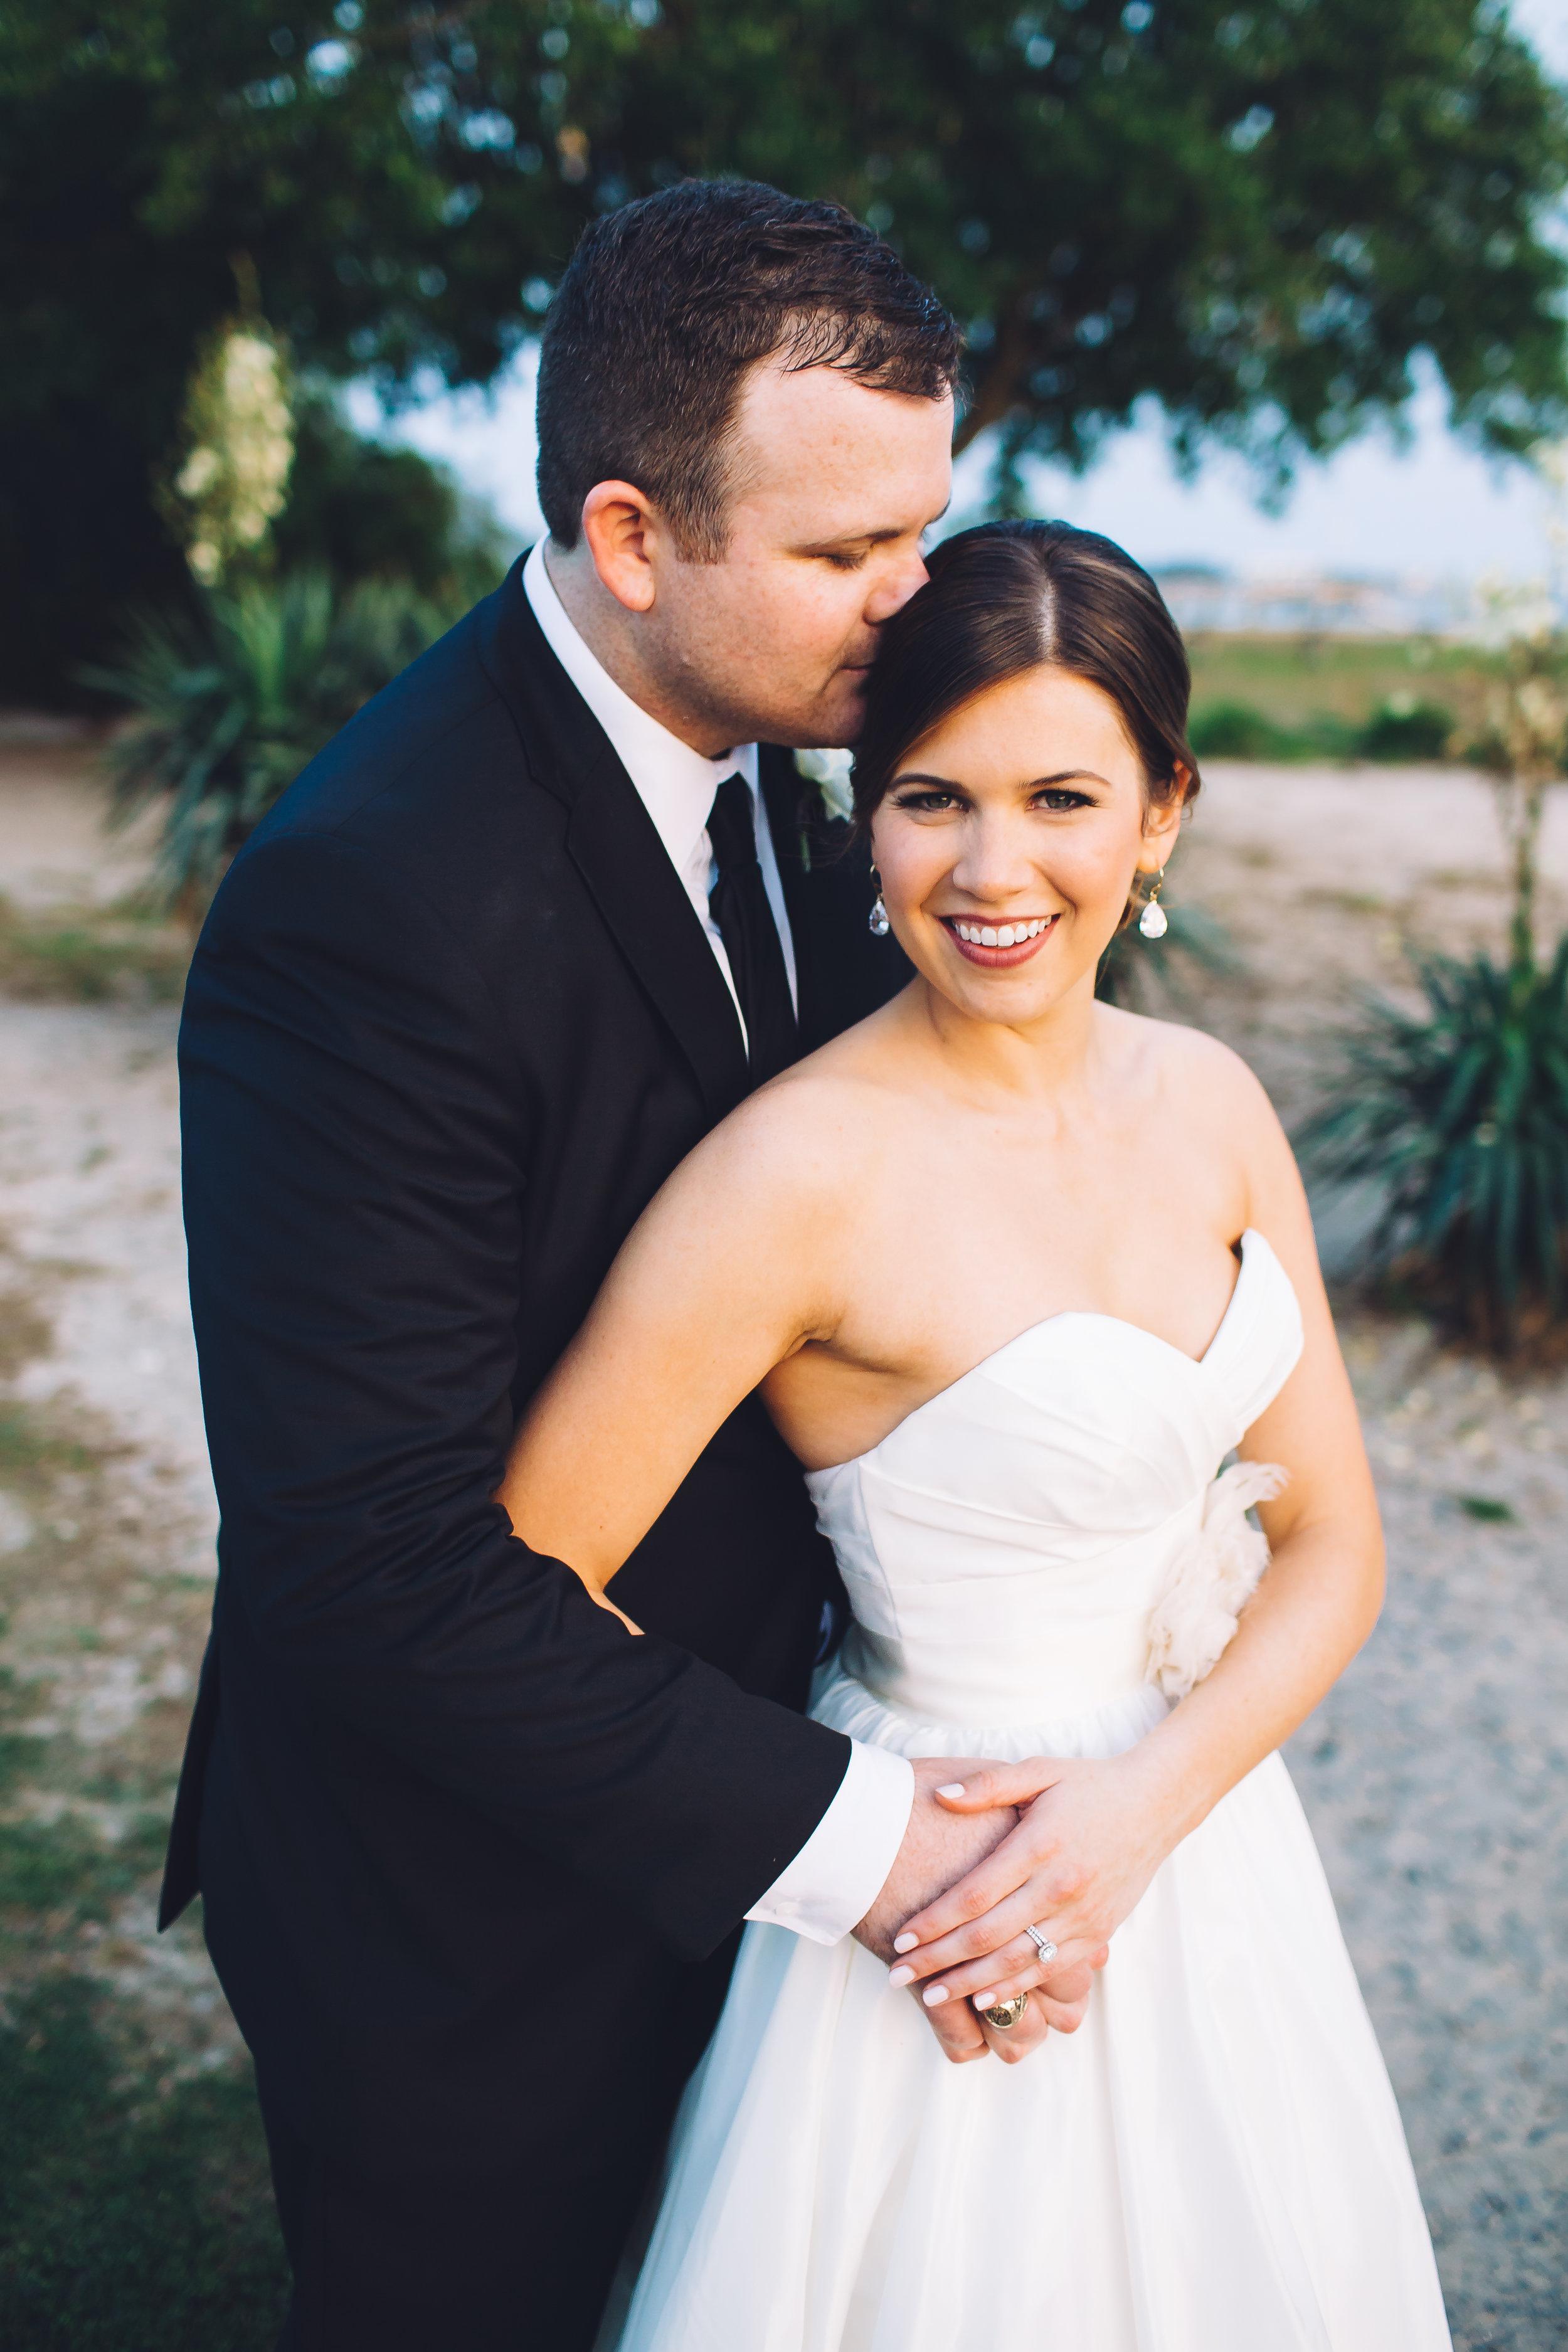 charleston wedding, charleston wedding photographers, charleston wedding photography, best charleston wedding photographers, destination wedding photographers, alhambra hall